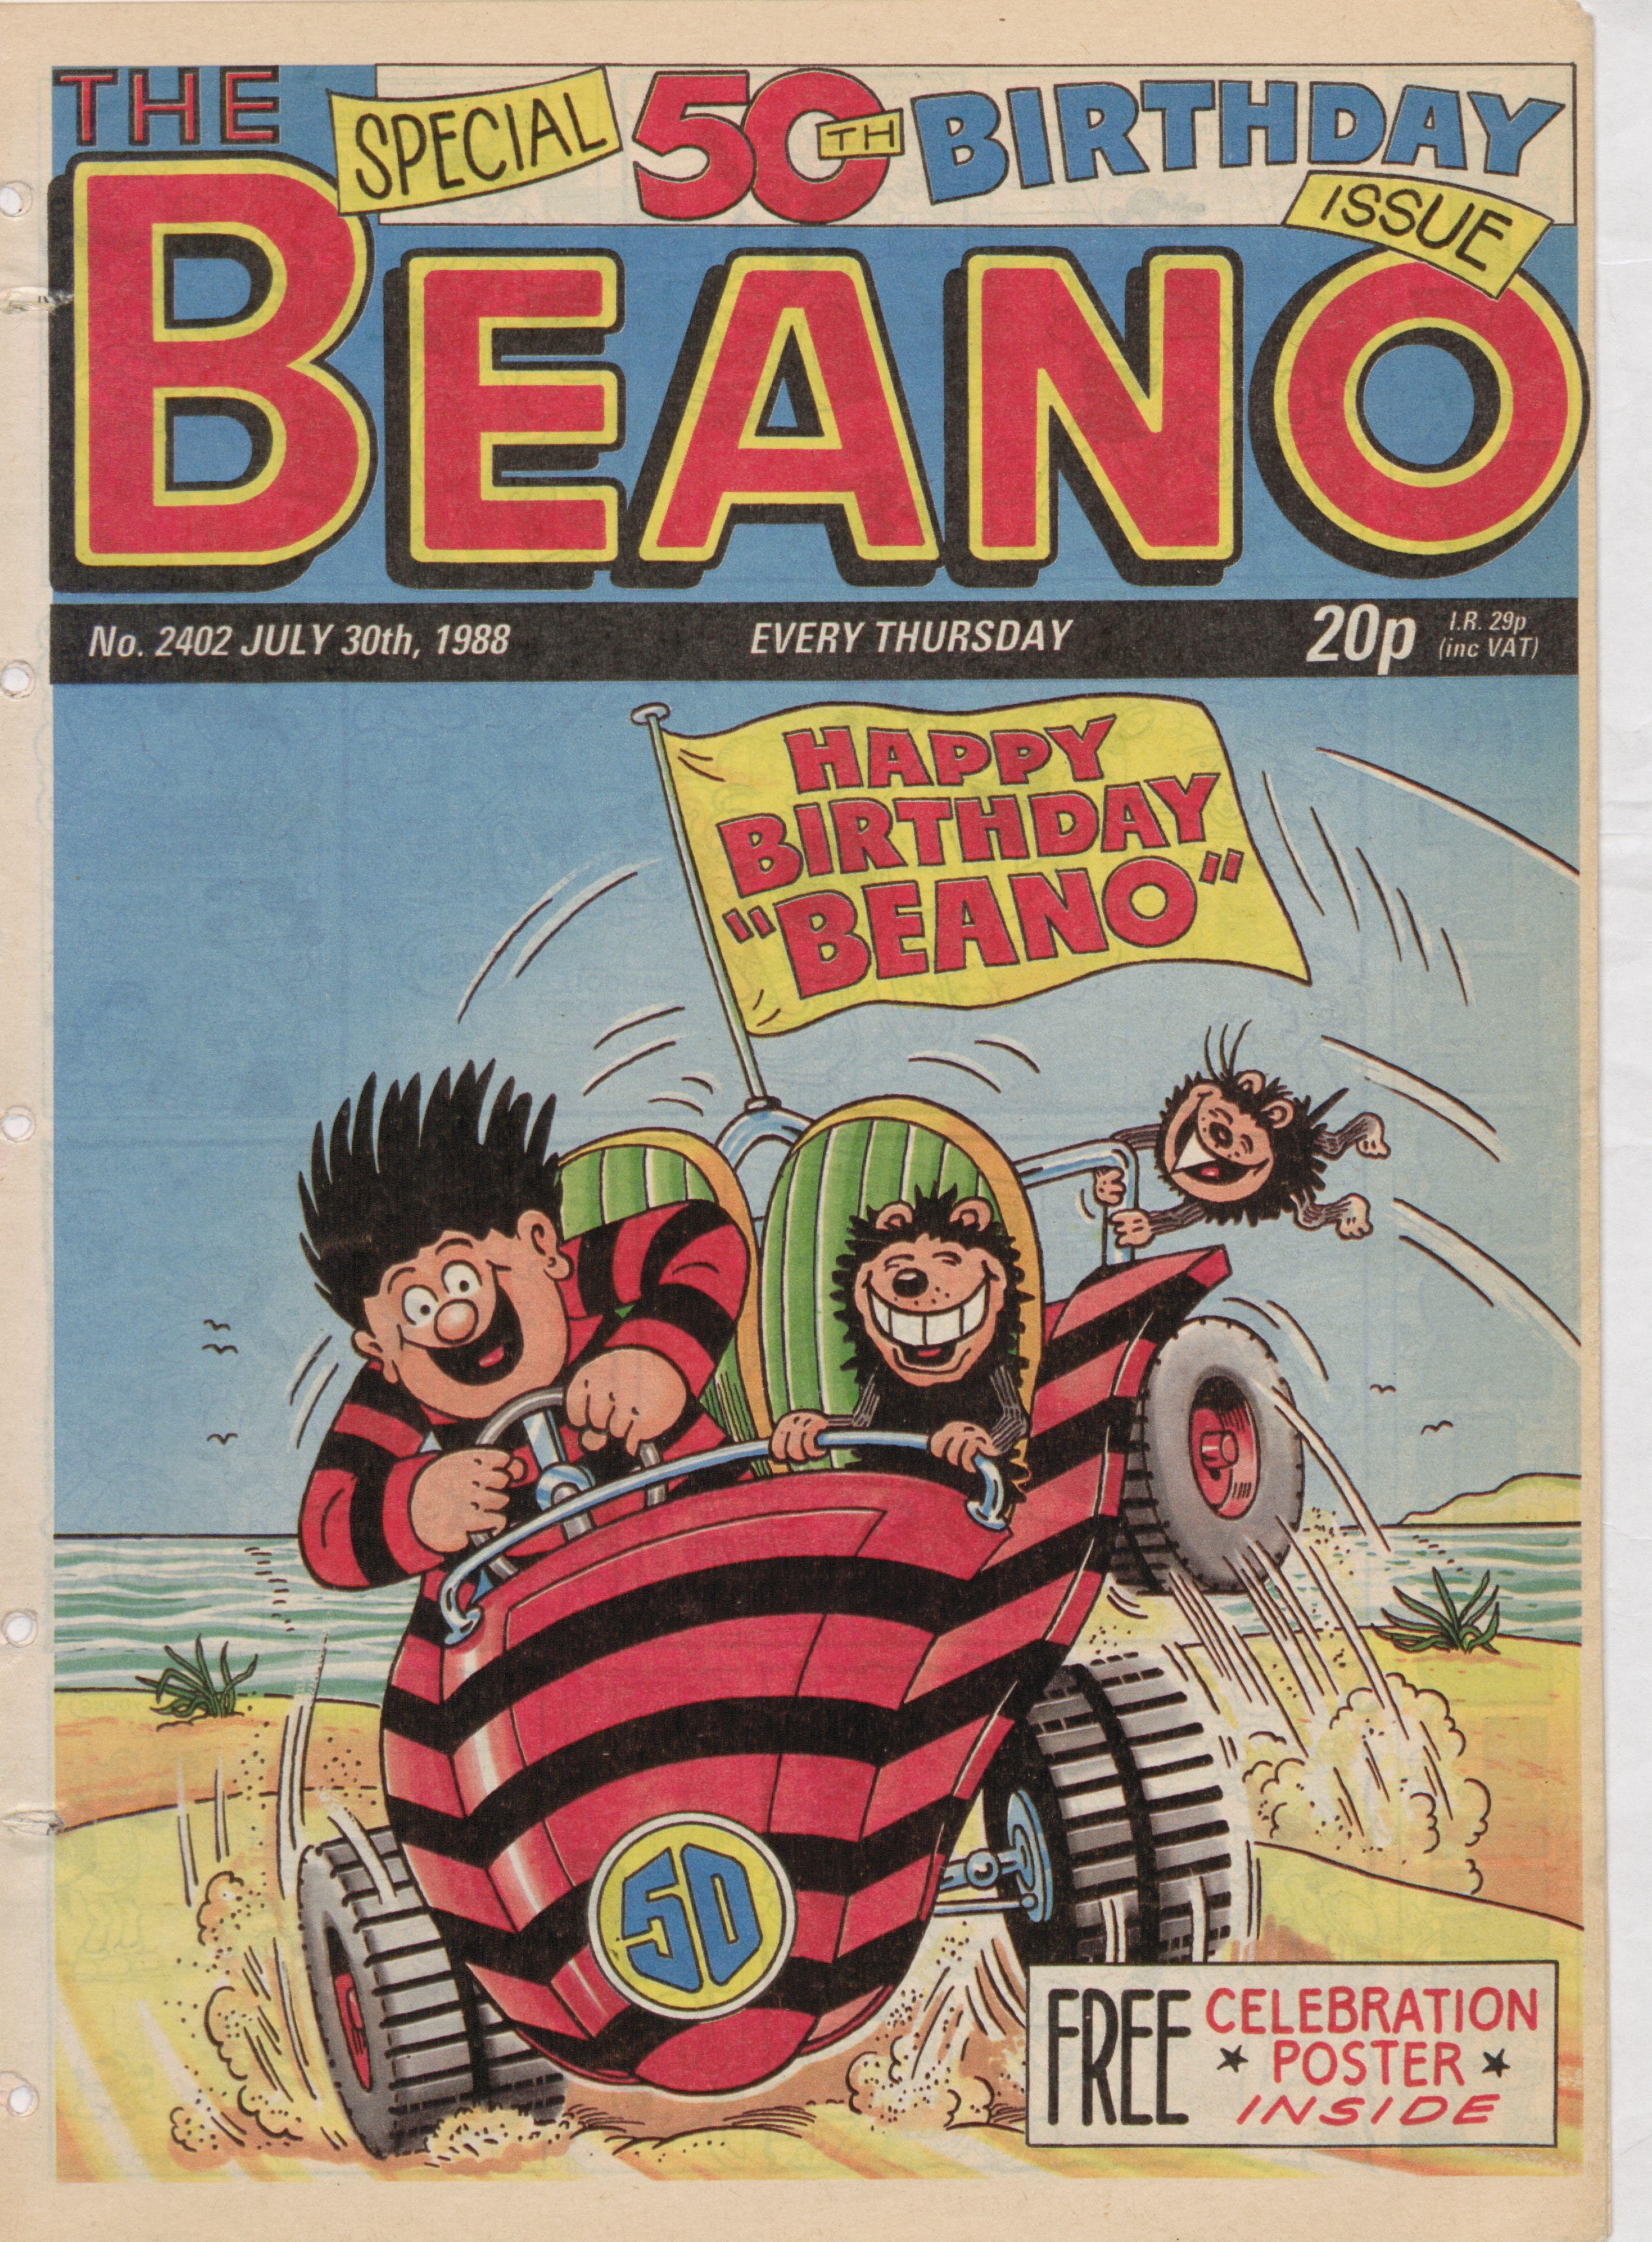 1988 beano cover